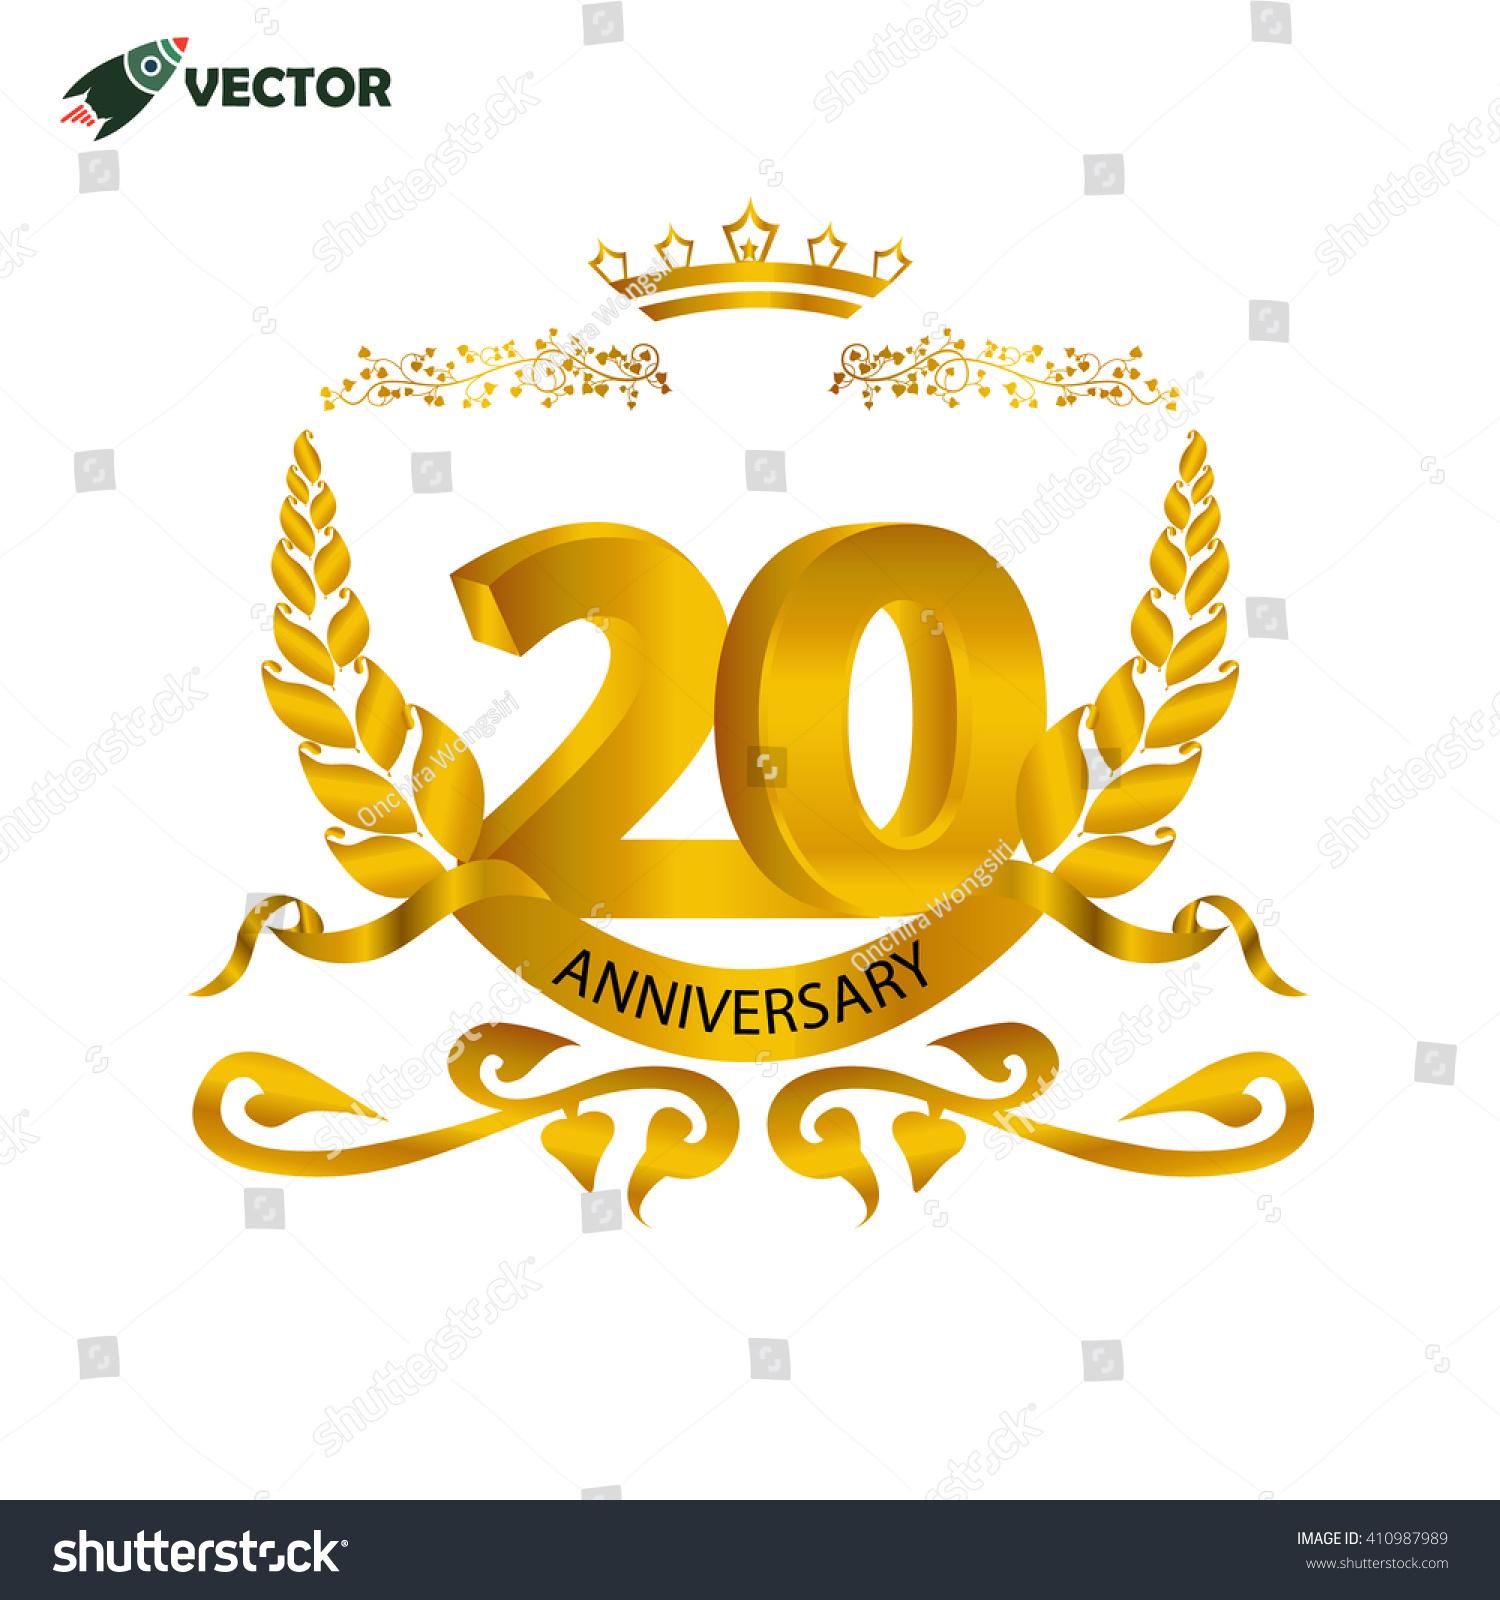 20th year anniversary wedding birthday winner stock vector 410987989 20th year anniversary wedding birthday and winner label and sign in gold biocorpaavc Choice Image